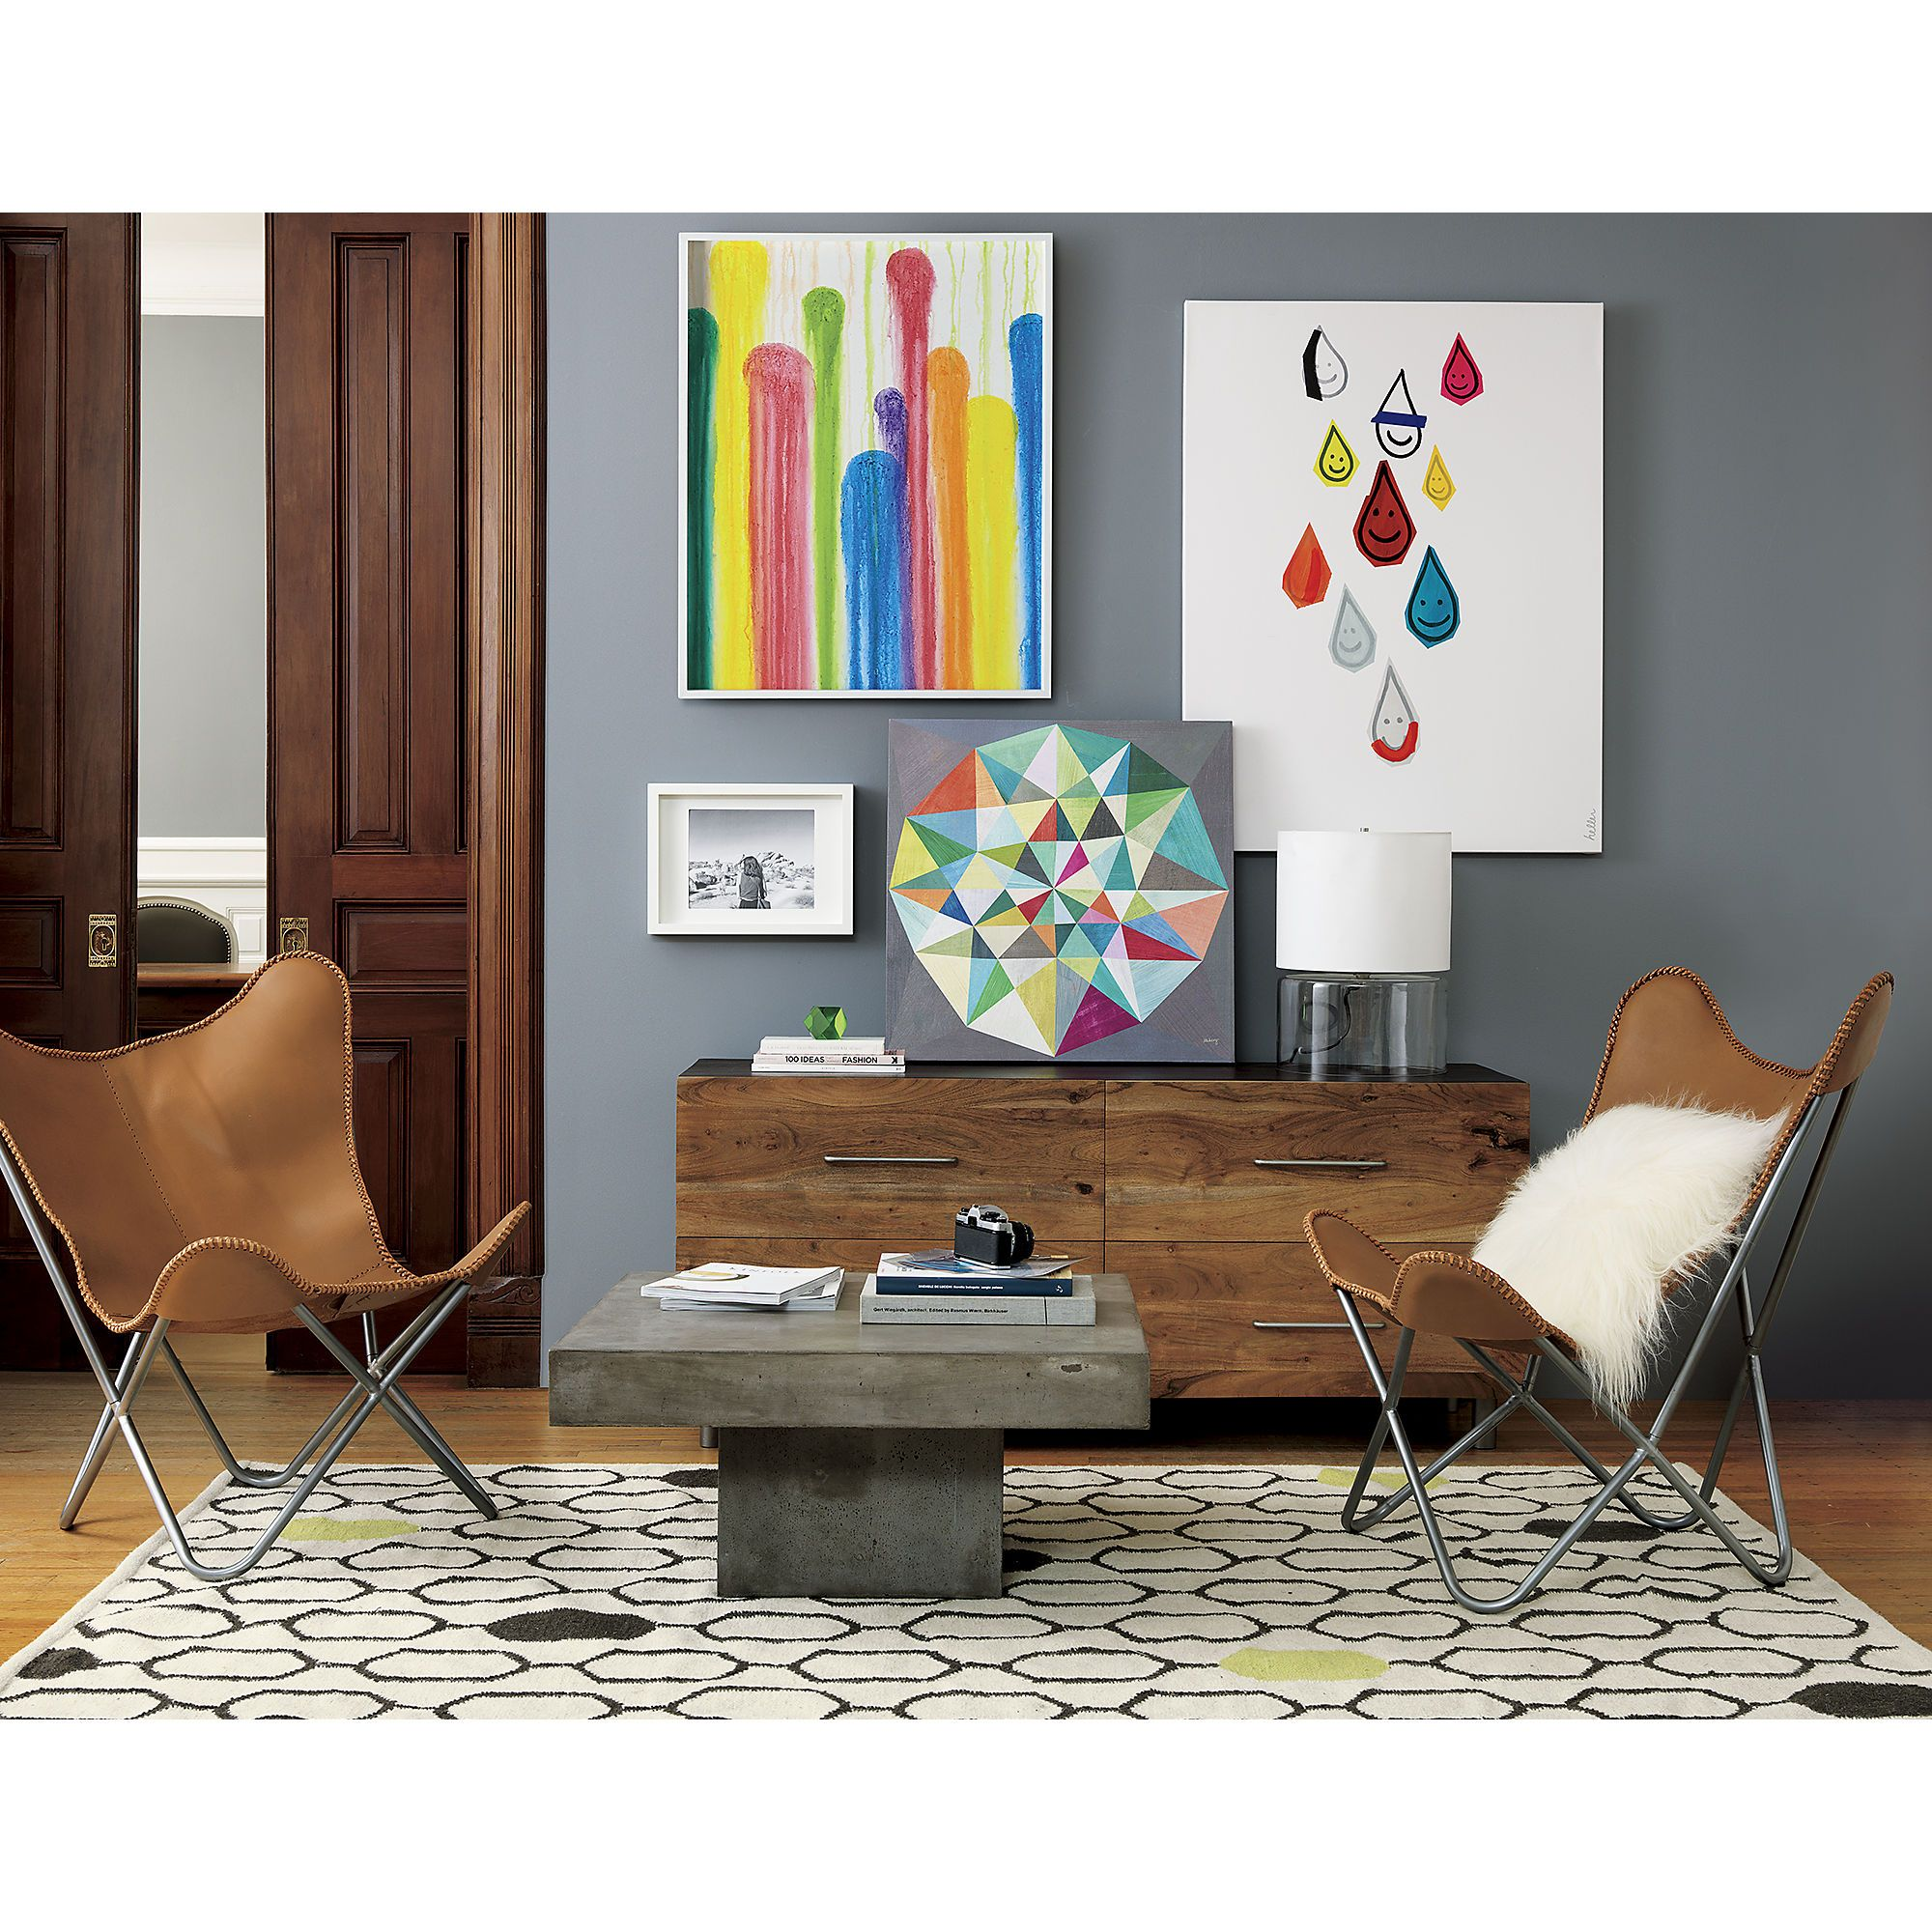 Element Coffee Table CB Living Room Pinterest Living Rooms - Cb2 element coffee table